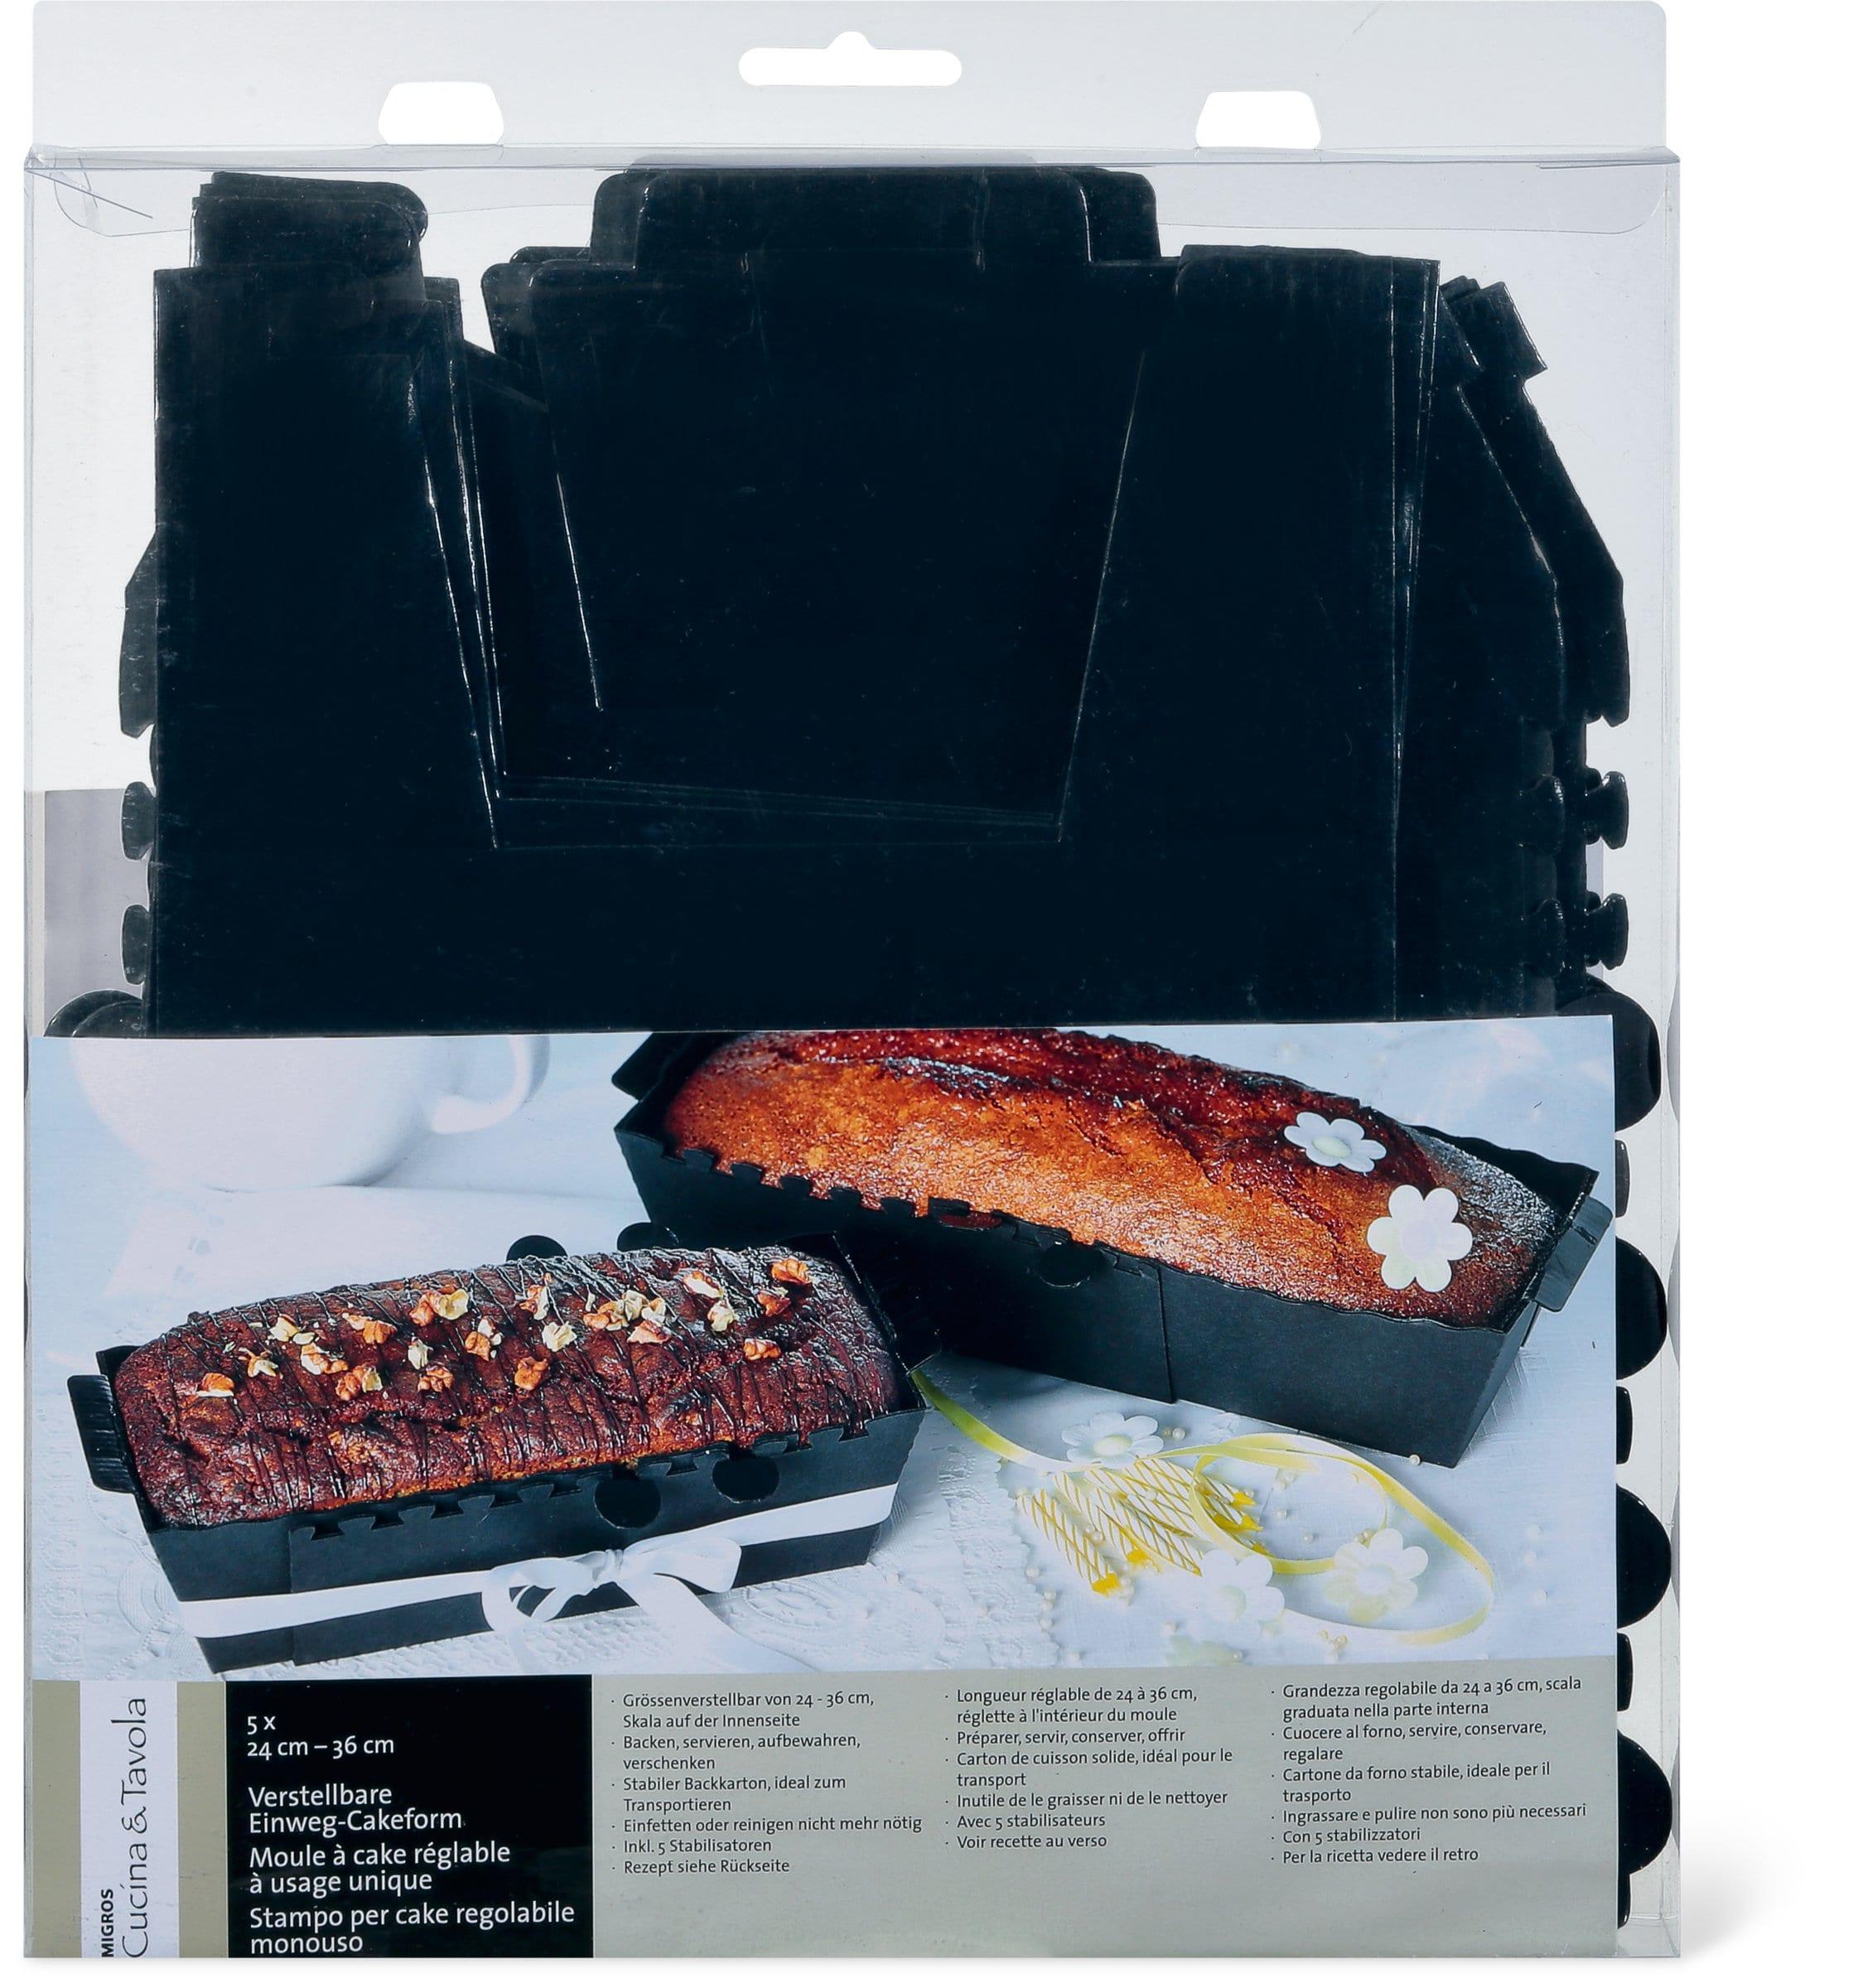 Verstellbare einweg cakeform cucina tavola migros for Cucina tavola